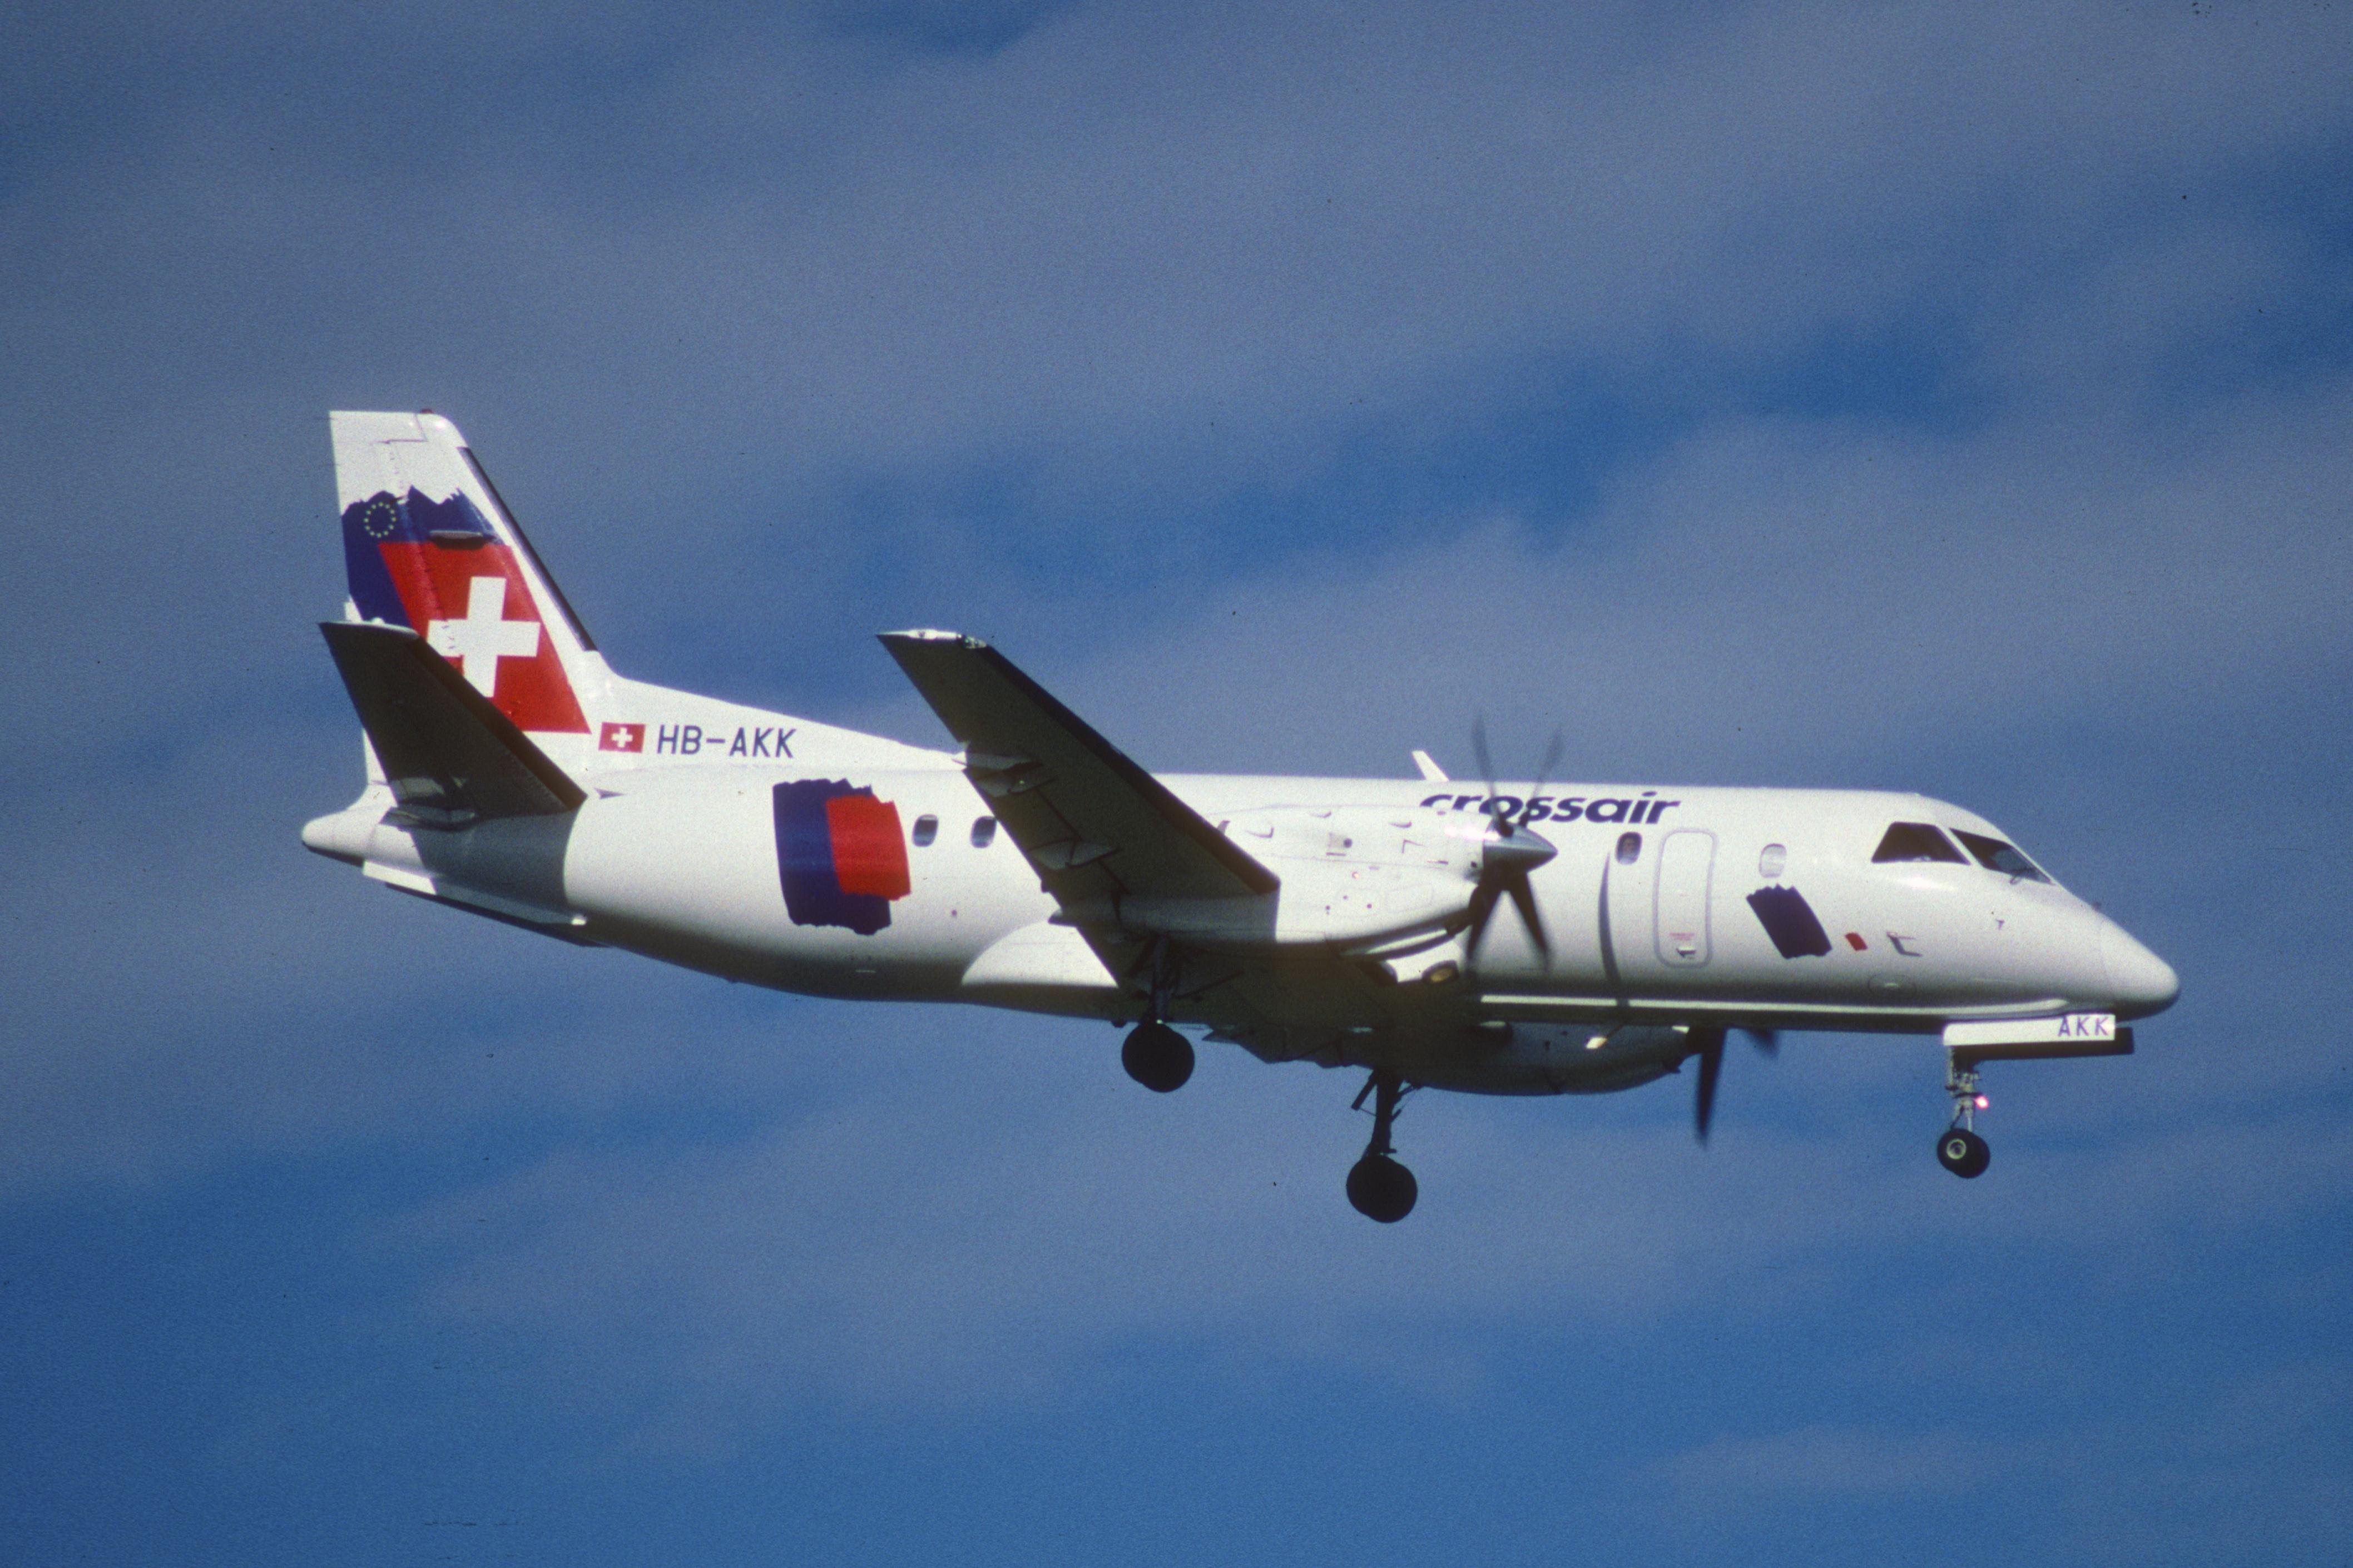 Crossair Flight 498 - Wikipedia